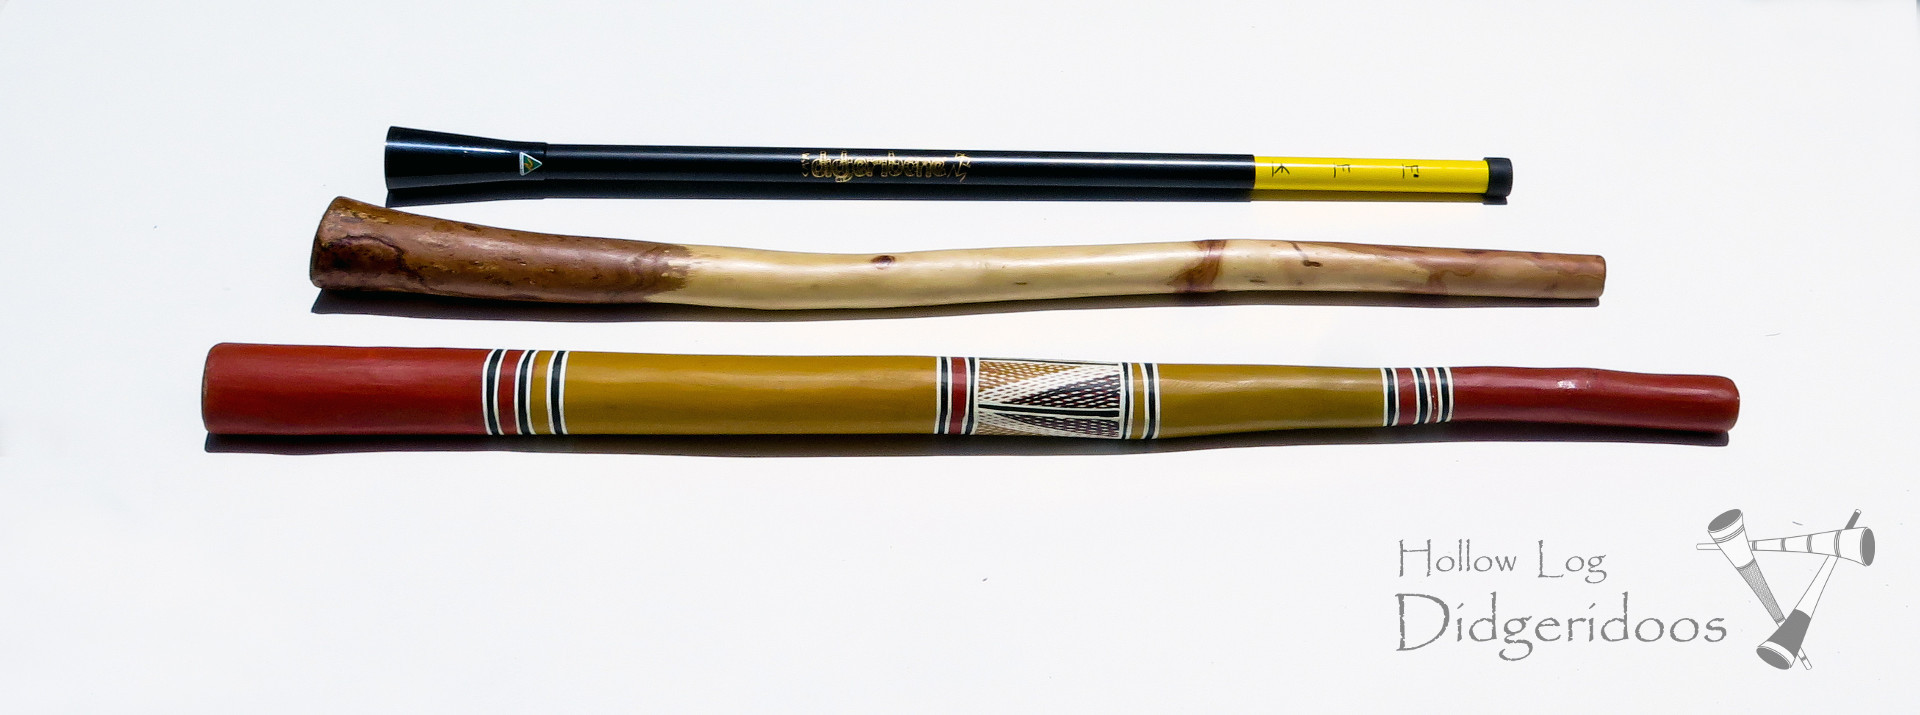 Különböző típusú didgeridook. Fentről: Didjeribone; eukaliptusz didgeridoo; tradicionális didgeridoo, 'yidaki, készítője Djalu Guruwiwi.